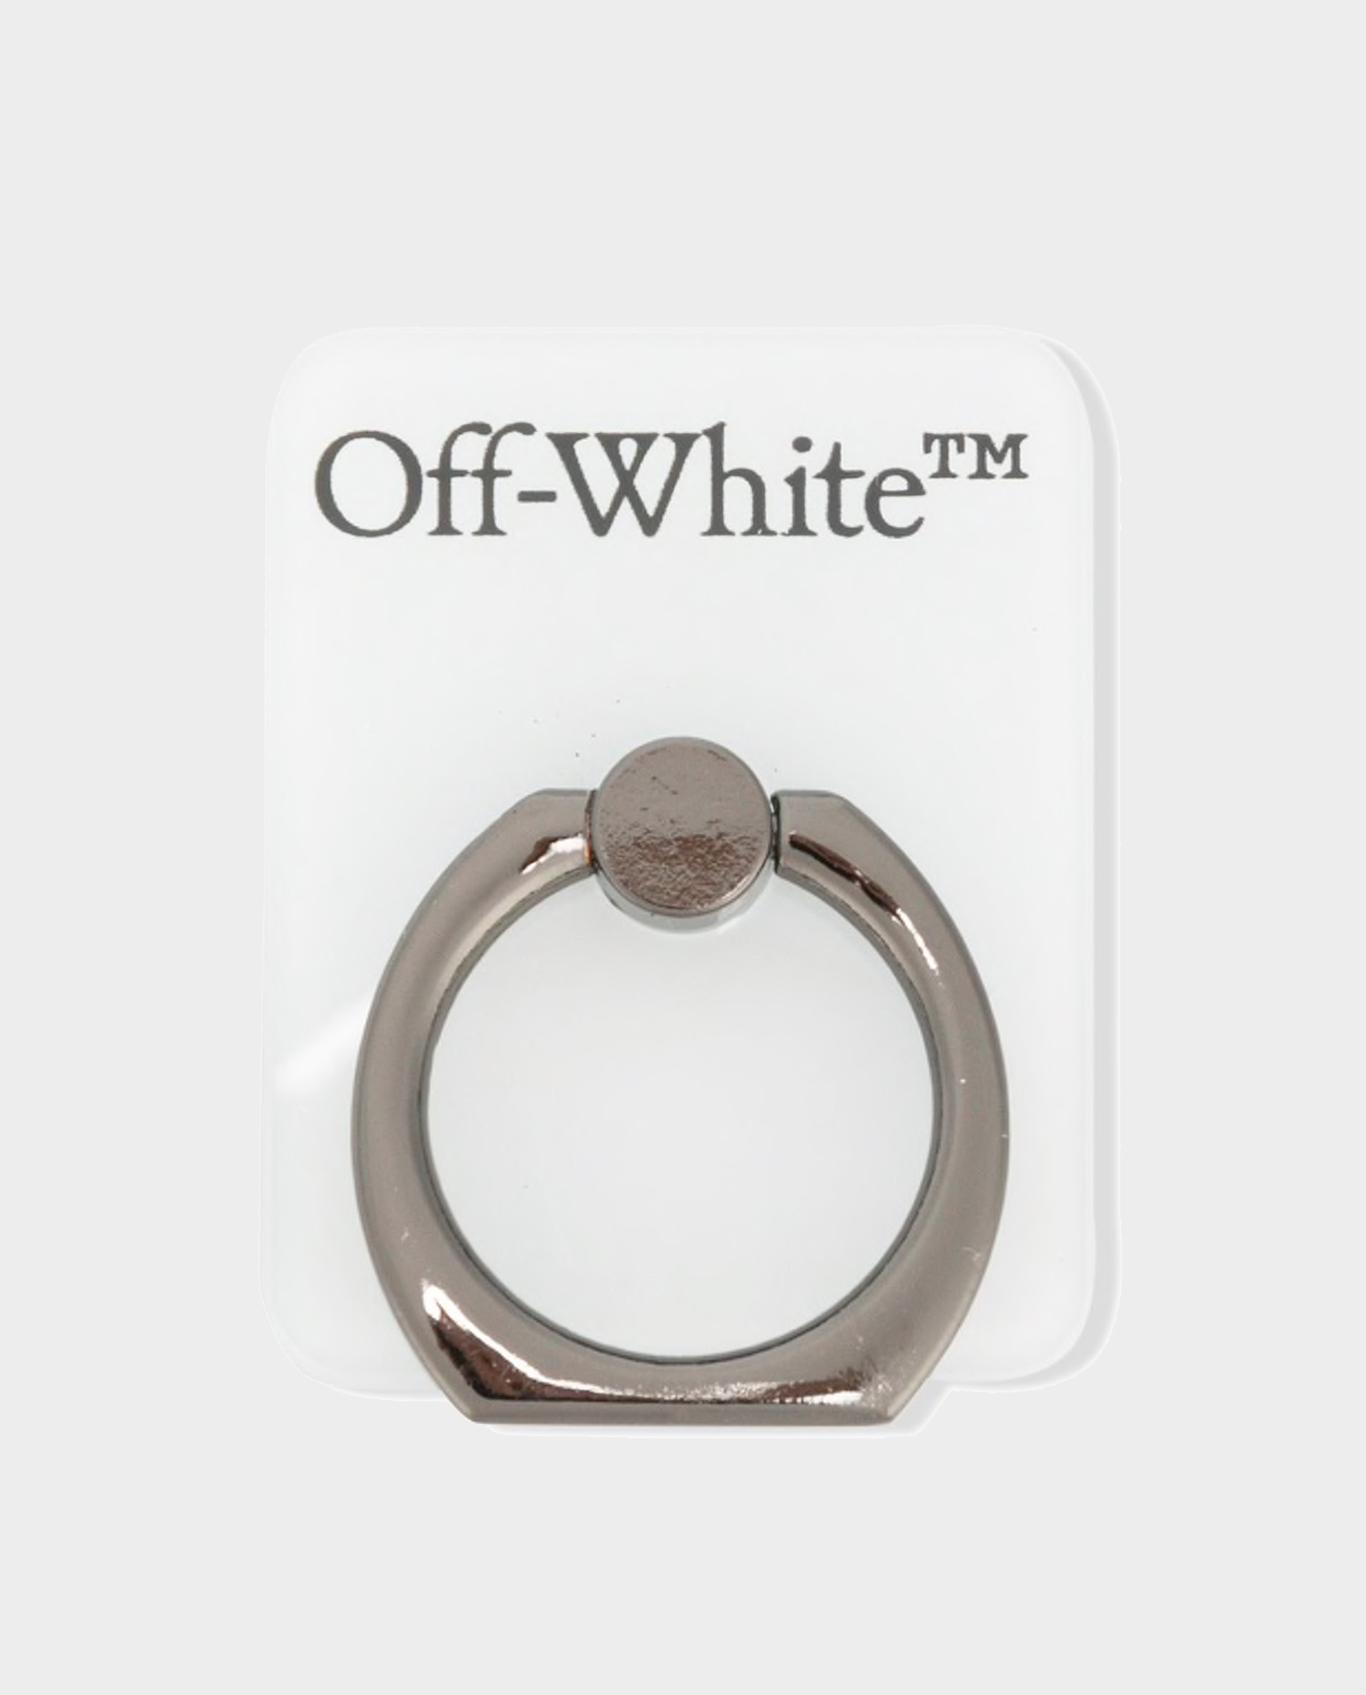 Uchwyt do telefonu ring off-white